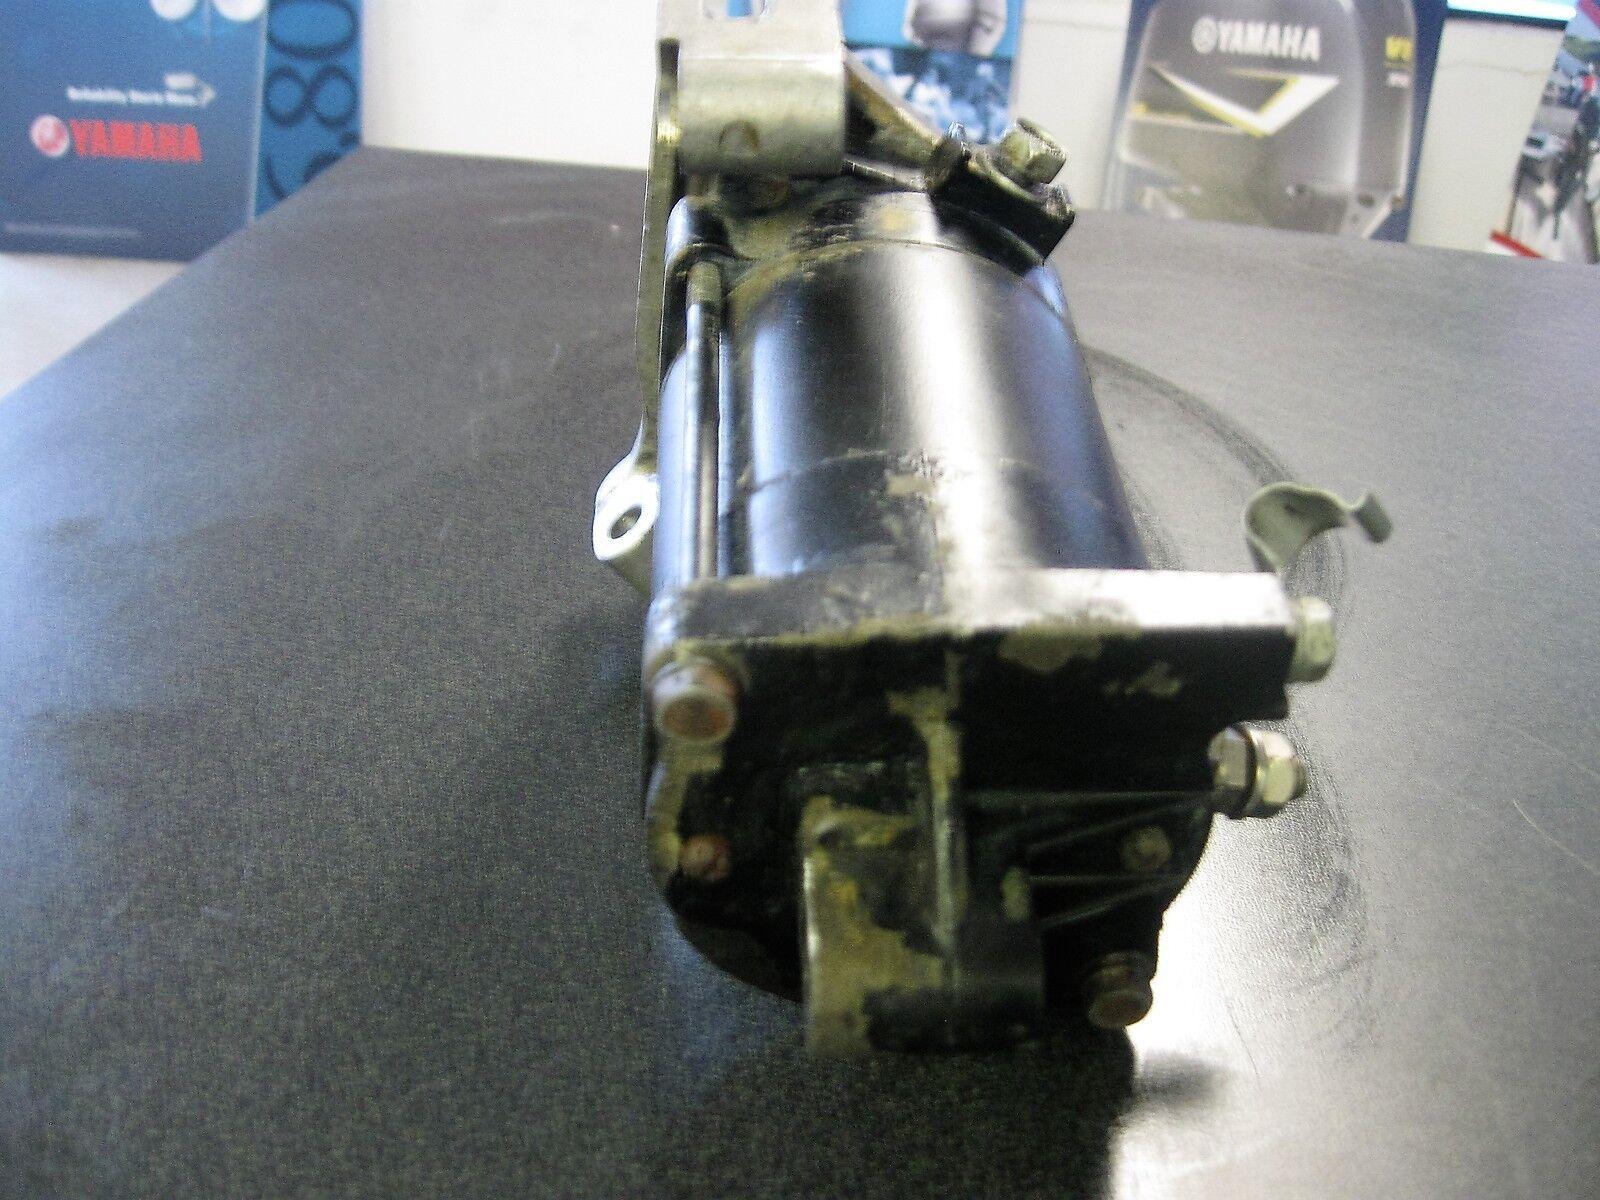 Yamaha Außenborder SX250TURB Starting Assy Motor Assy Starting 61A-81800-01-00 2964b2